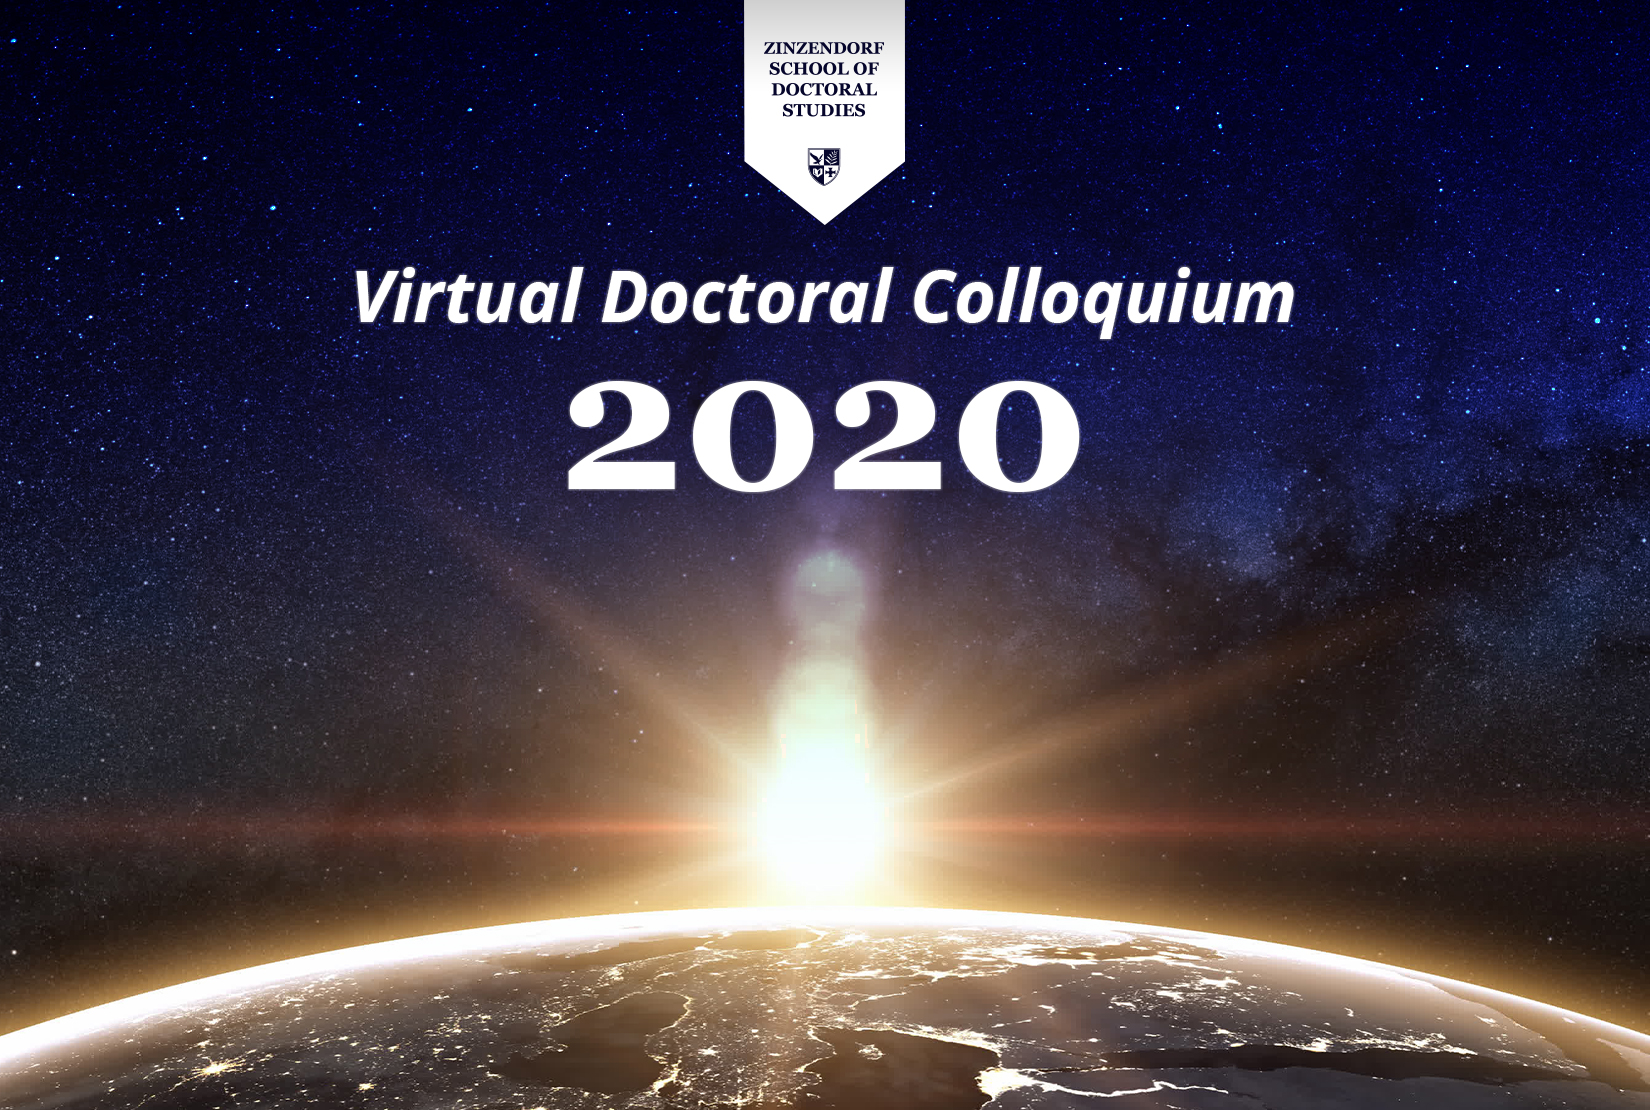 olivet-university-zsds-concludes-virtual-doctoral-colloquium-2020